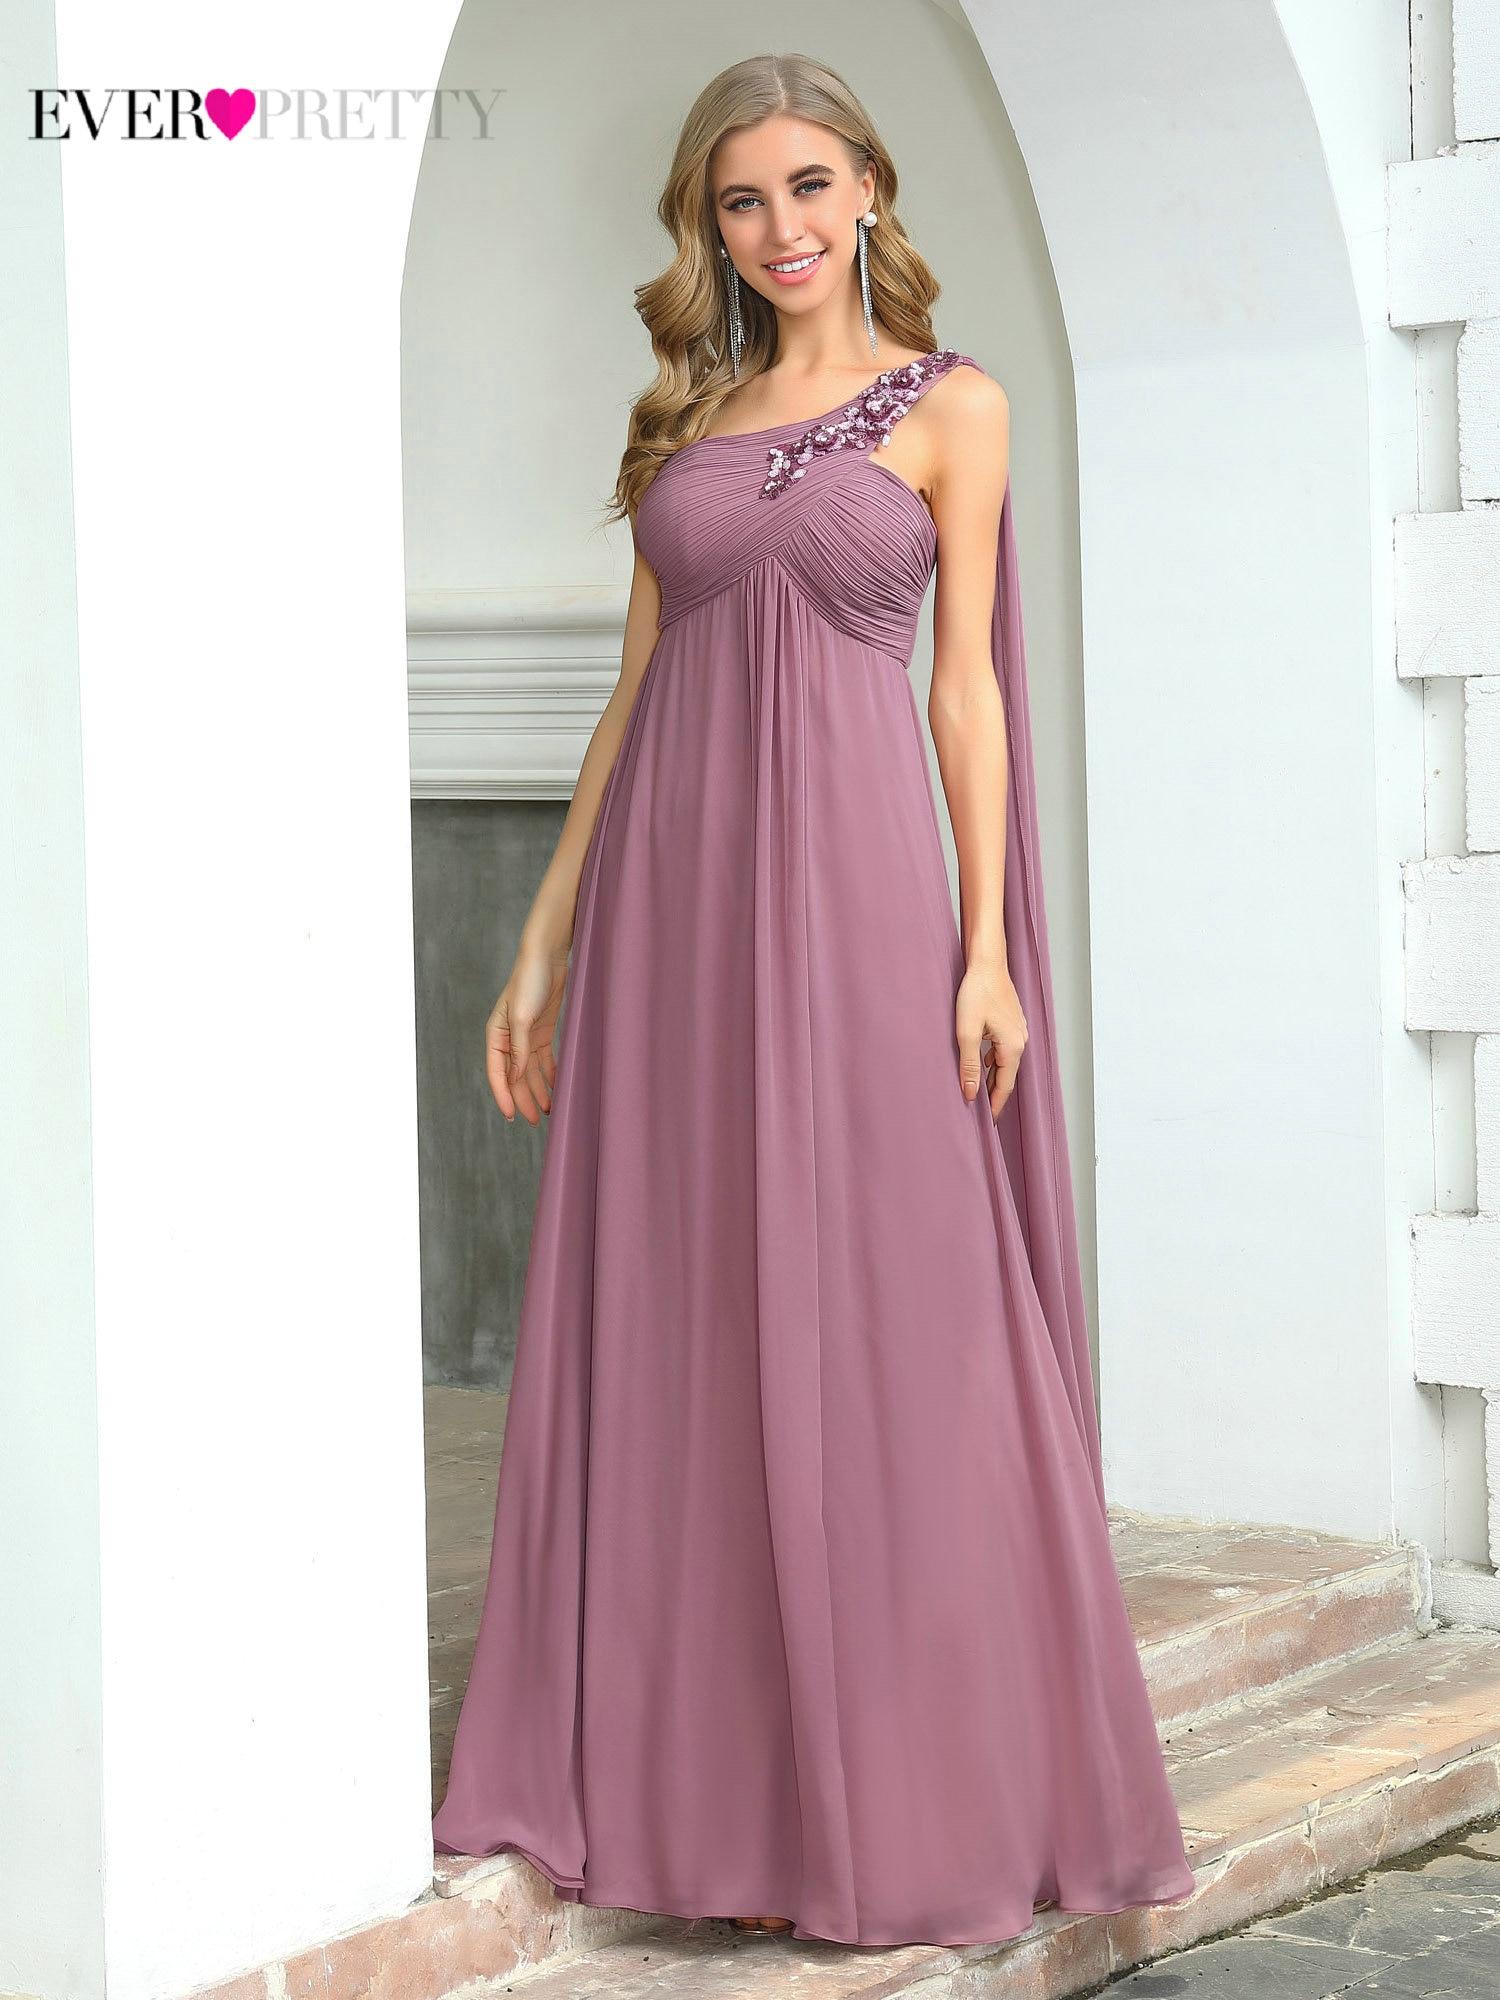 Bridesmaid-Dresses Party-Dress Ever Pretty Dusty Pink Weddings Elegant Women Chiffon